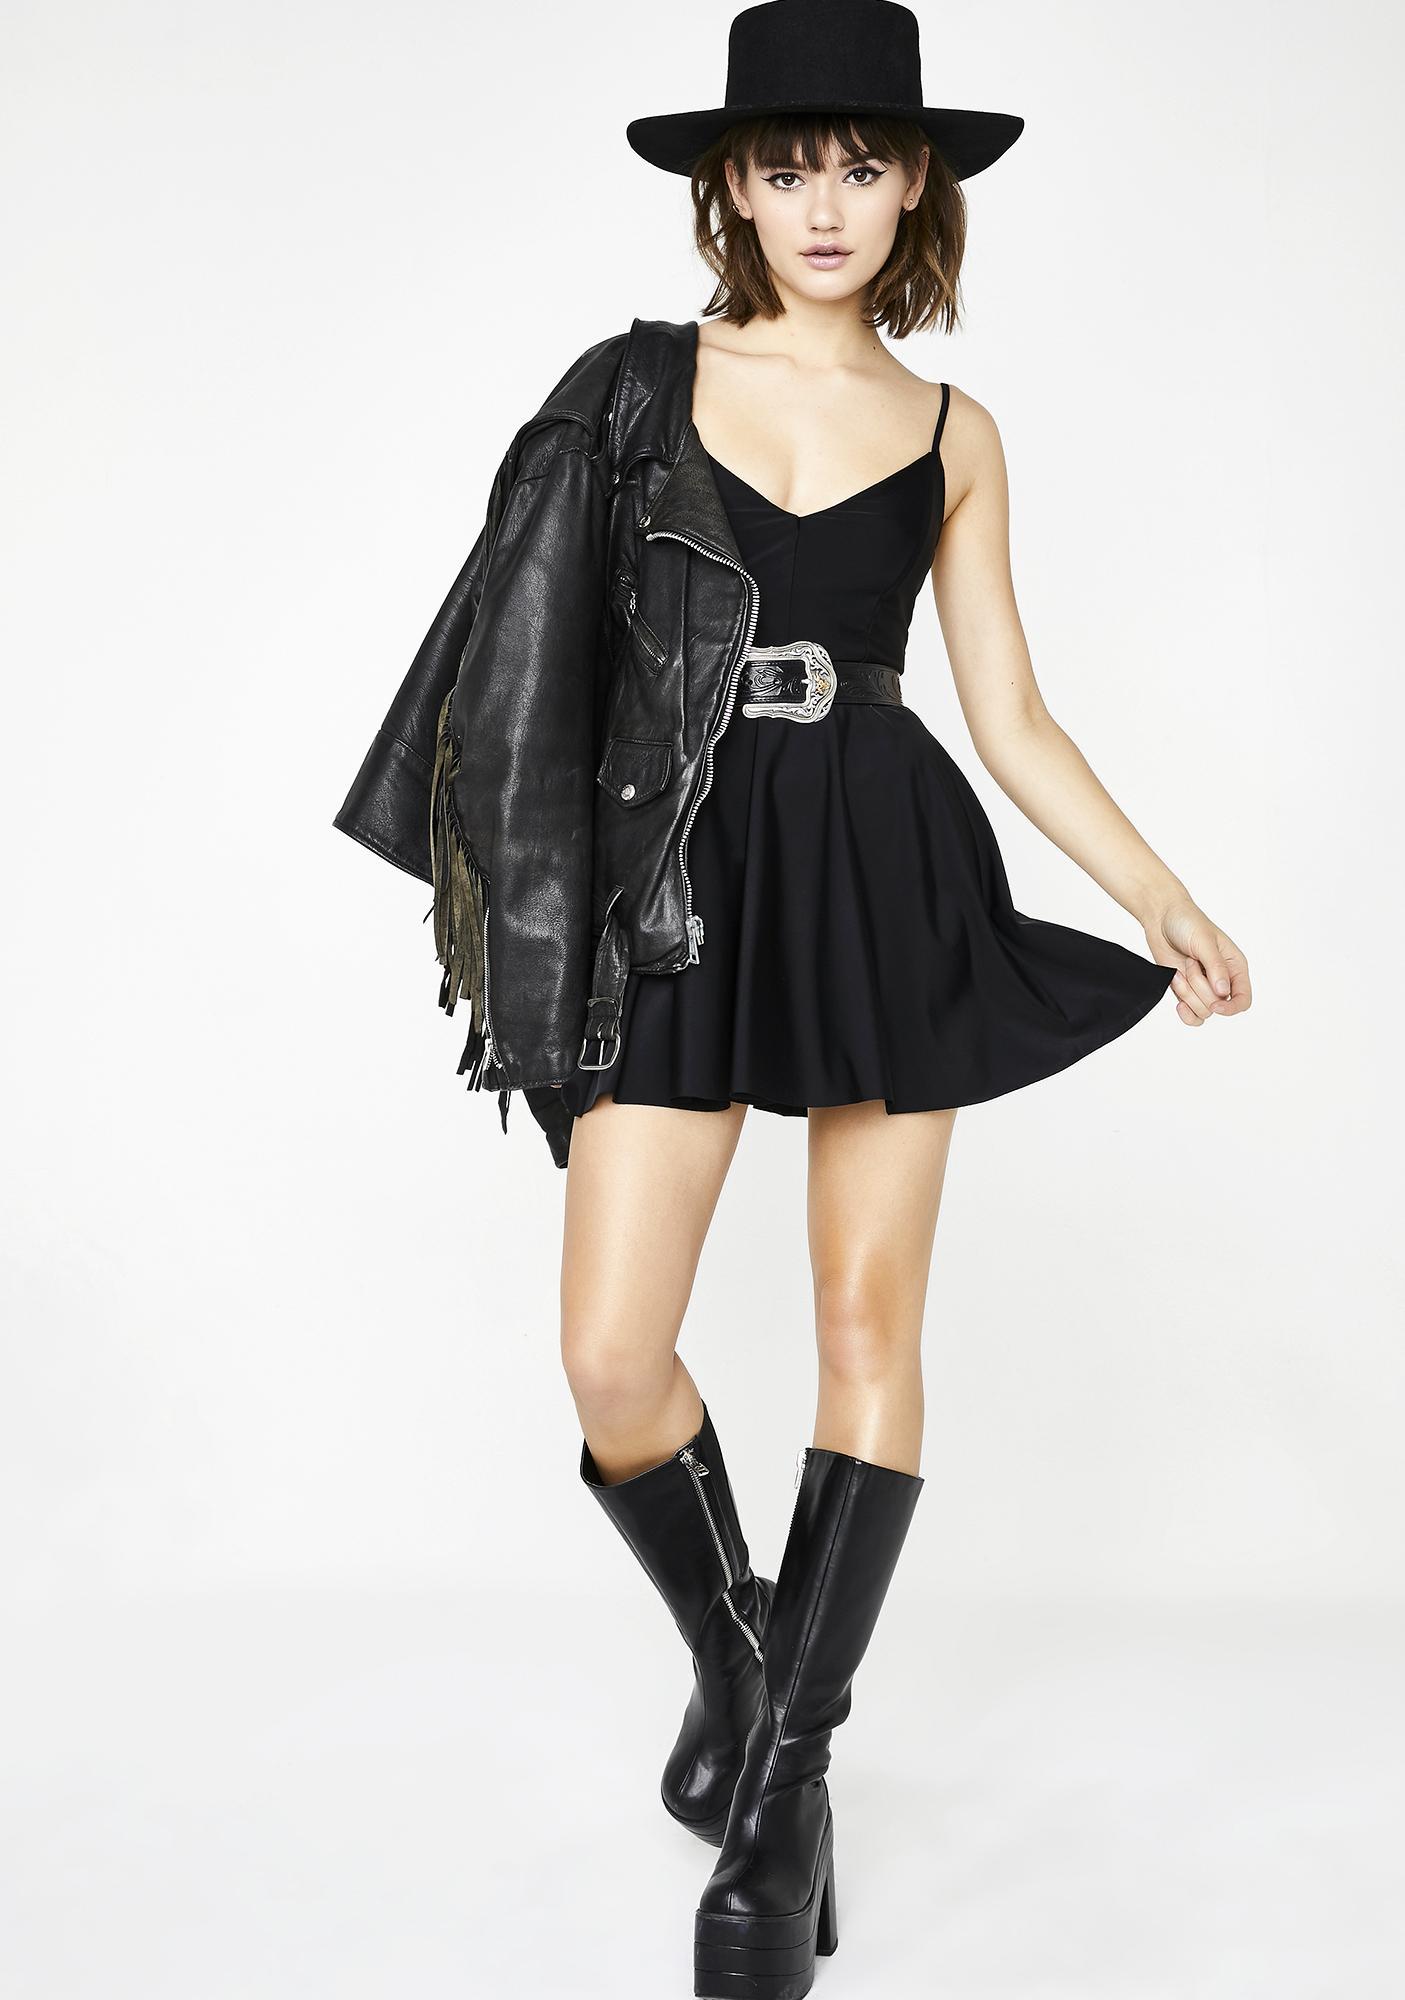 Kiki Riki Way Out West Mini Dress